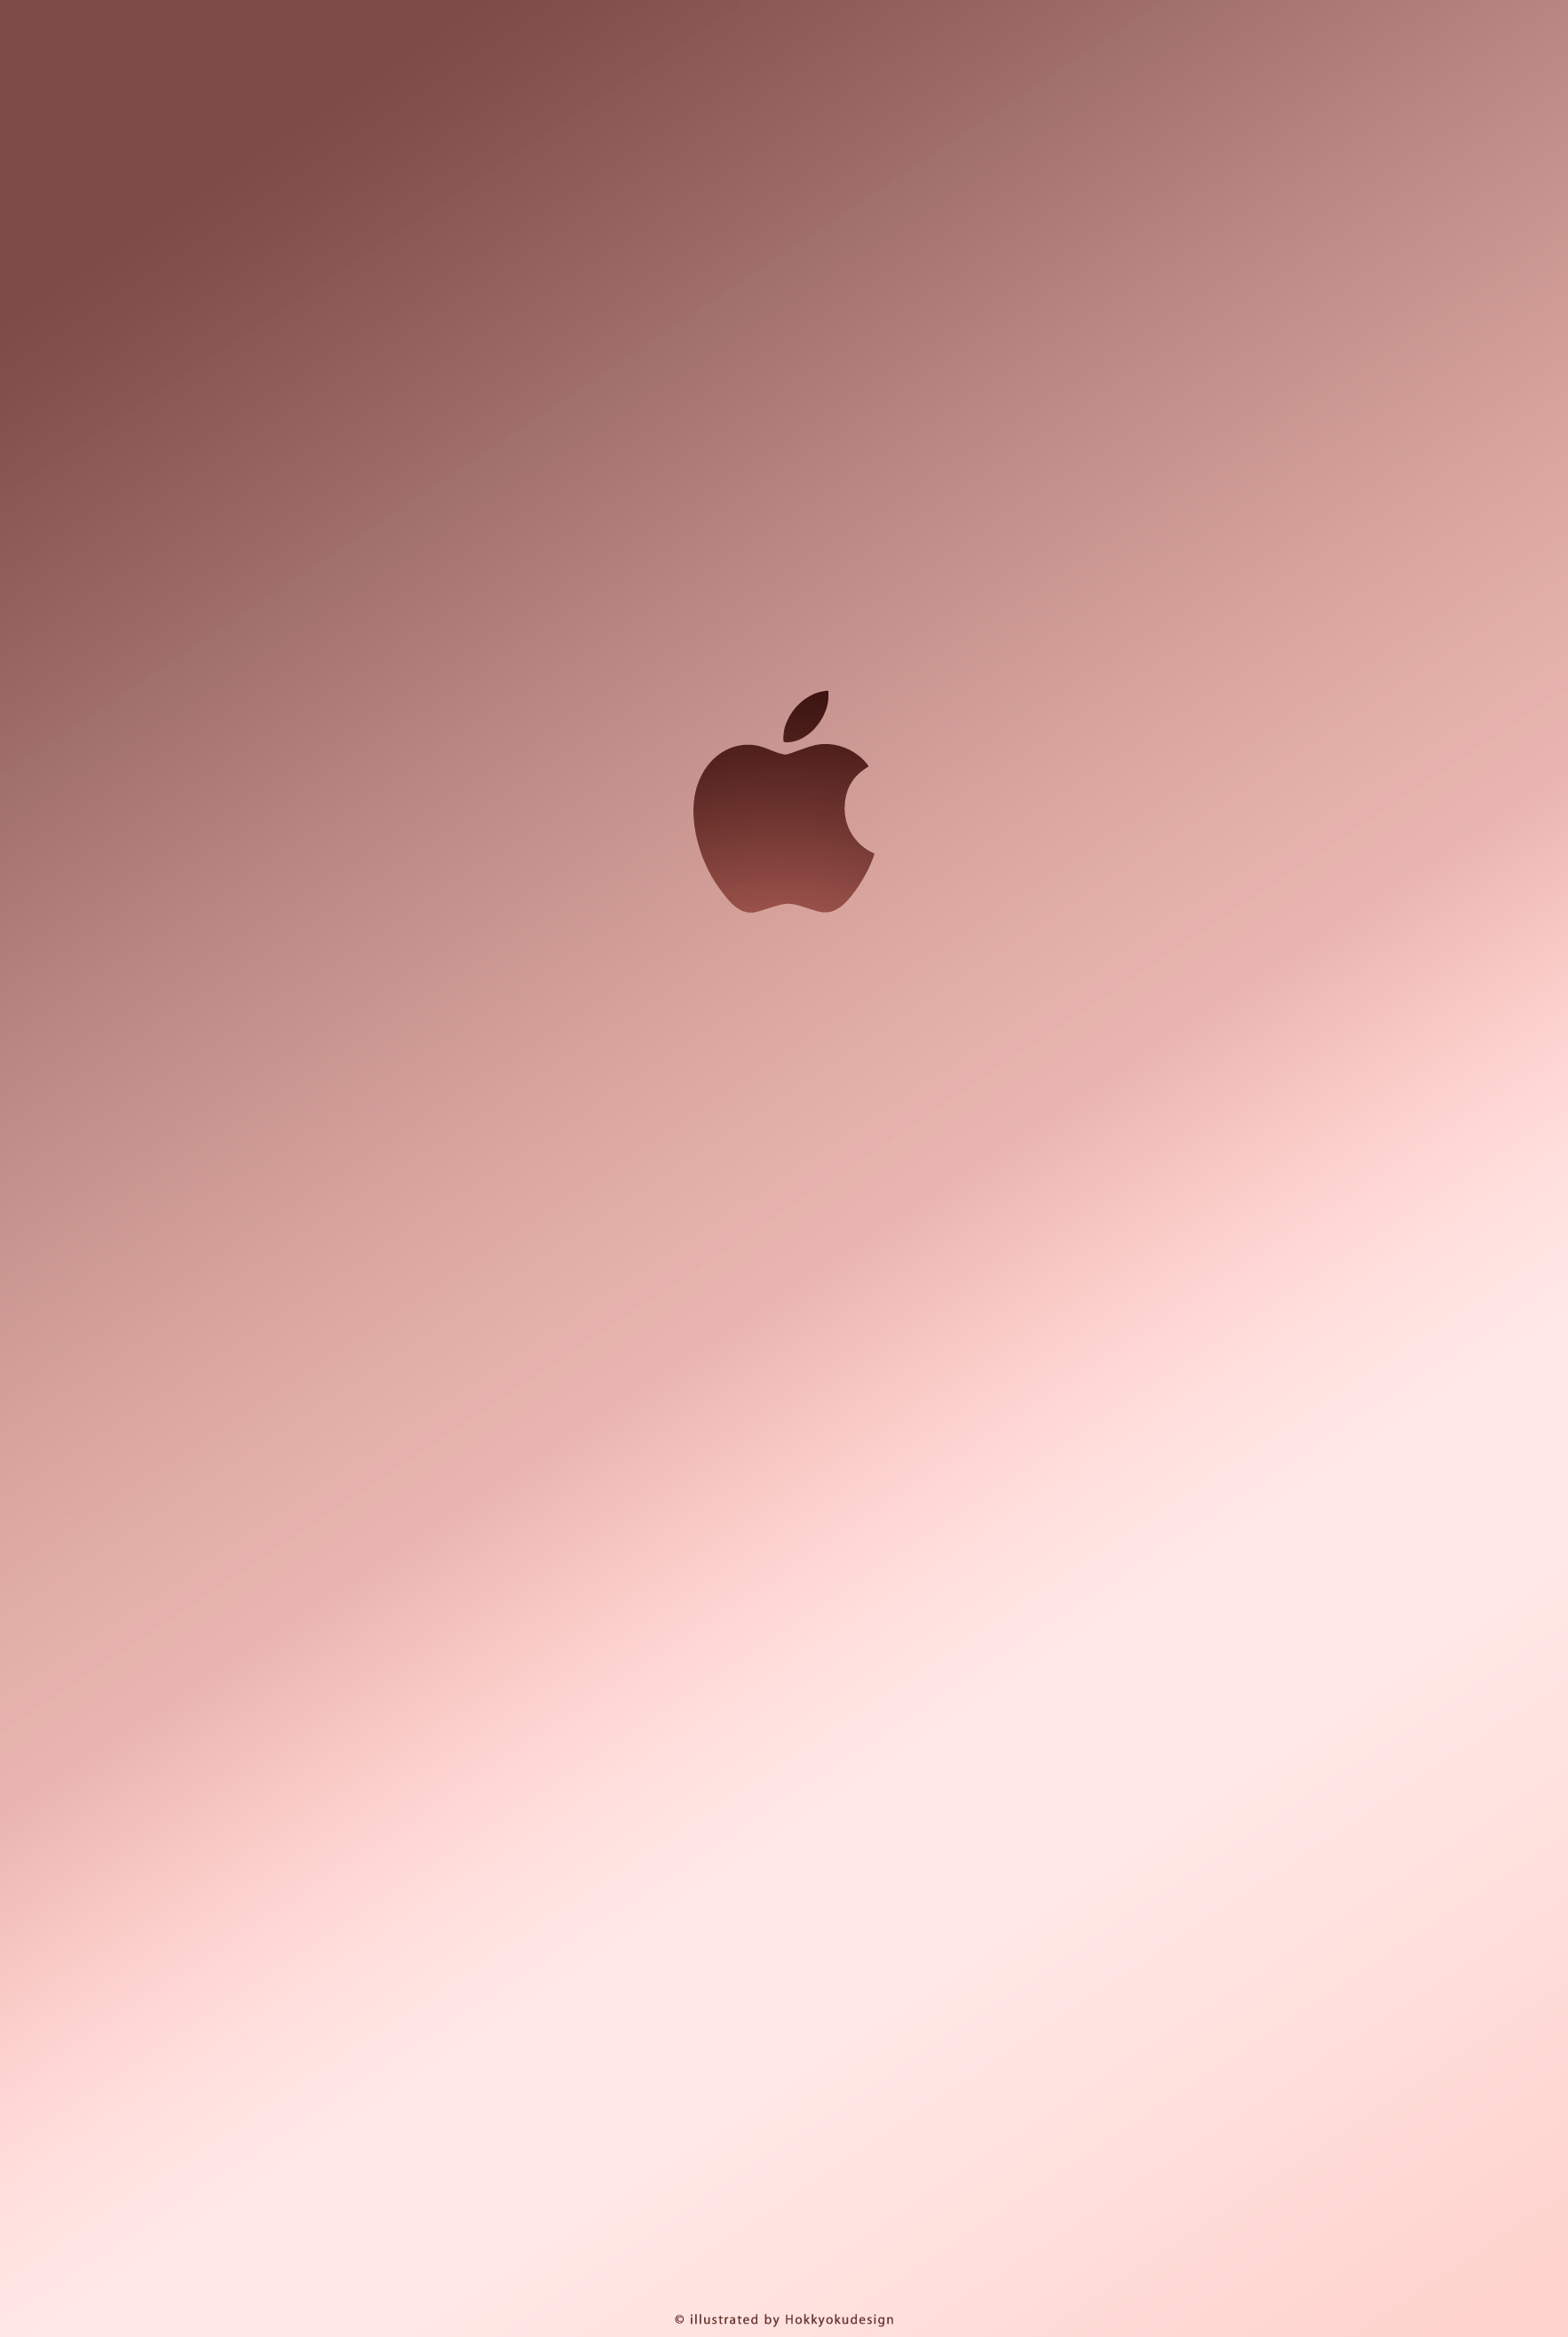 Apple iPhone Rose Wallpaper – Bing images